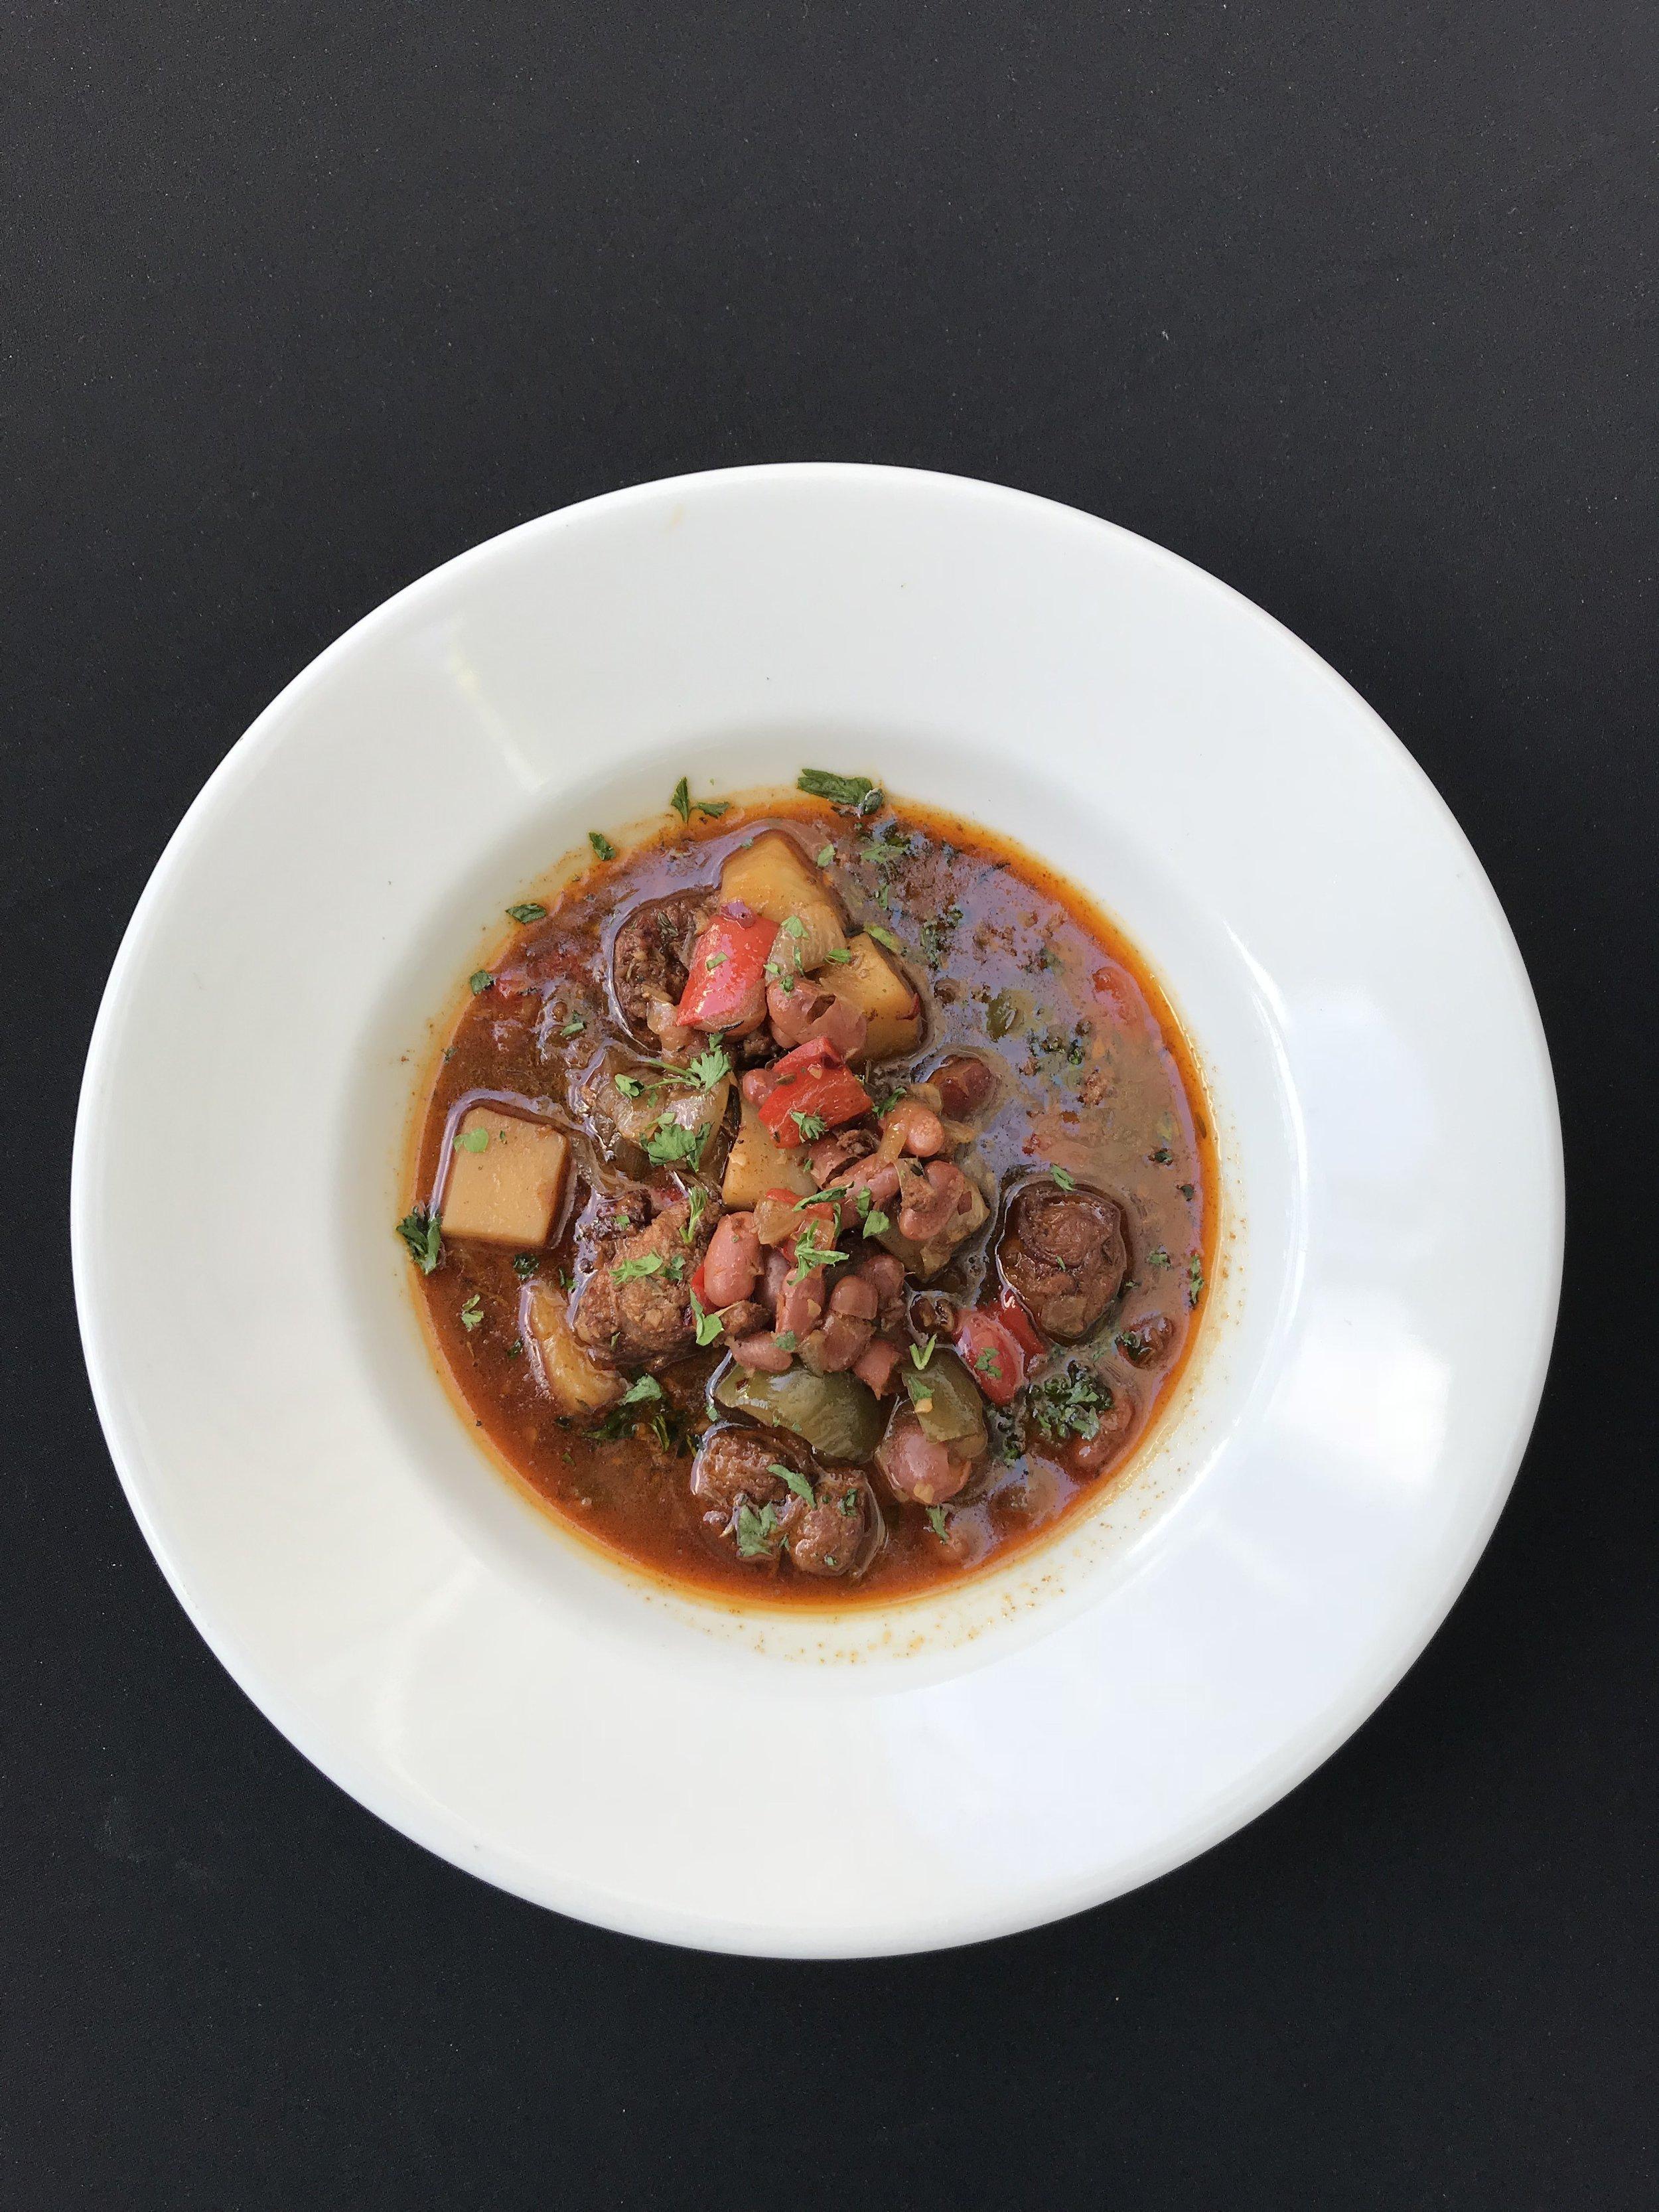 - Sopa de Chorizo A Spanish style soup made with carrot, potato, chorizo, onion, paprika, chicken stock, and parsley